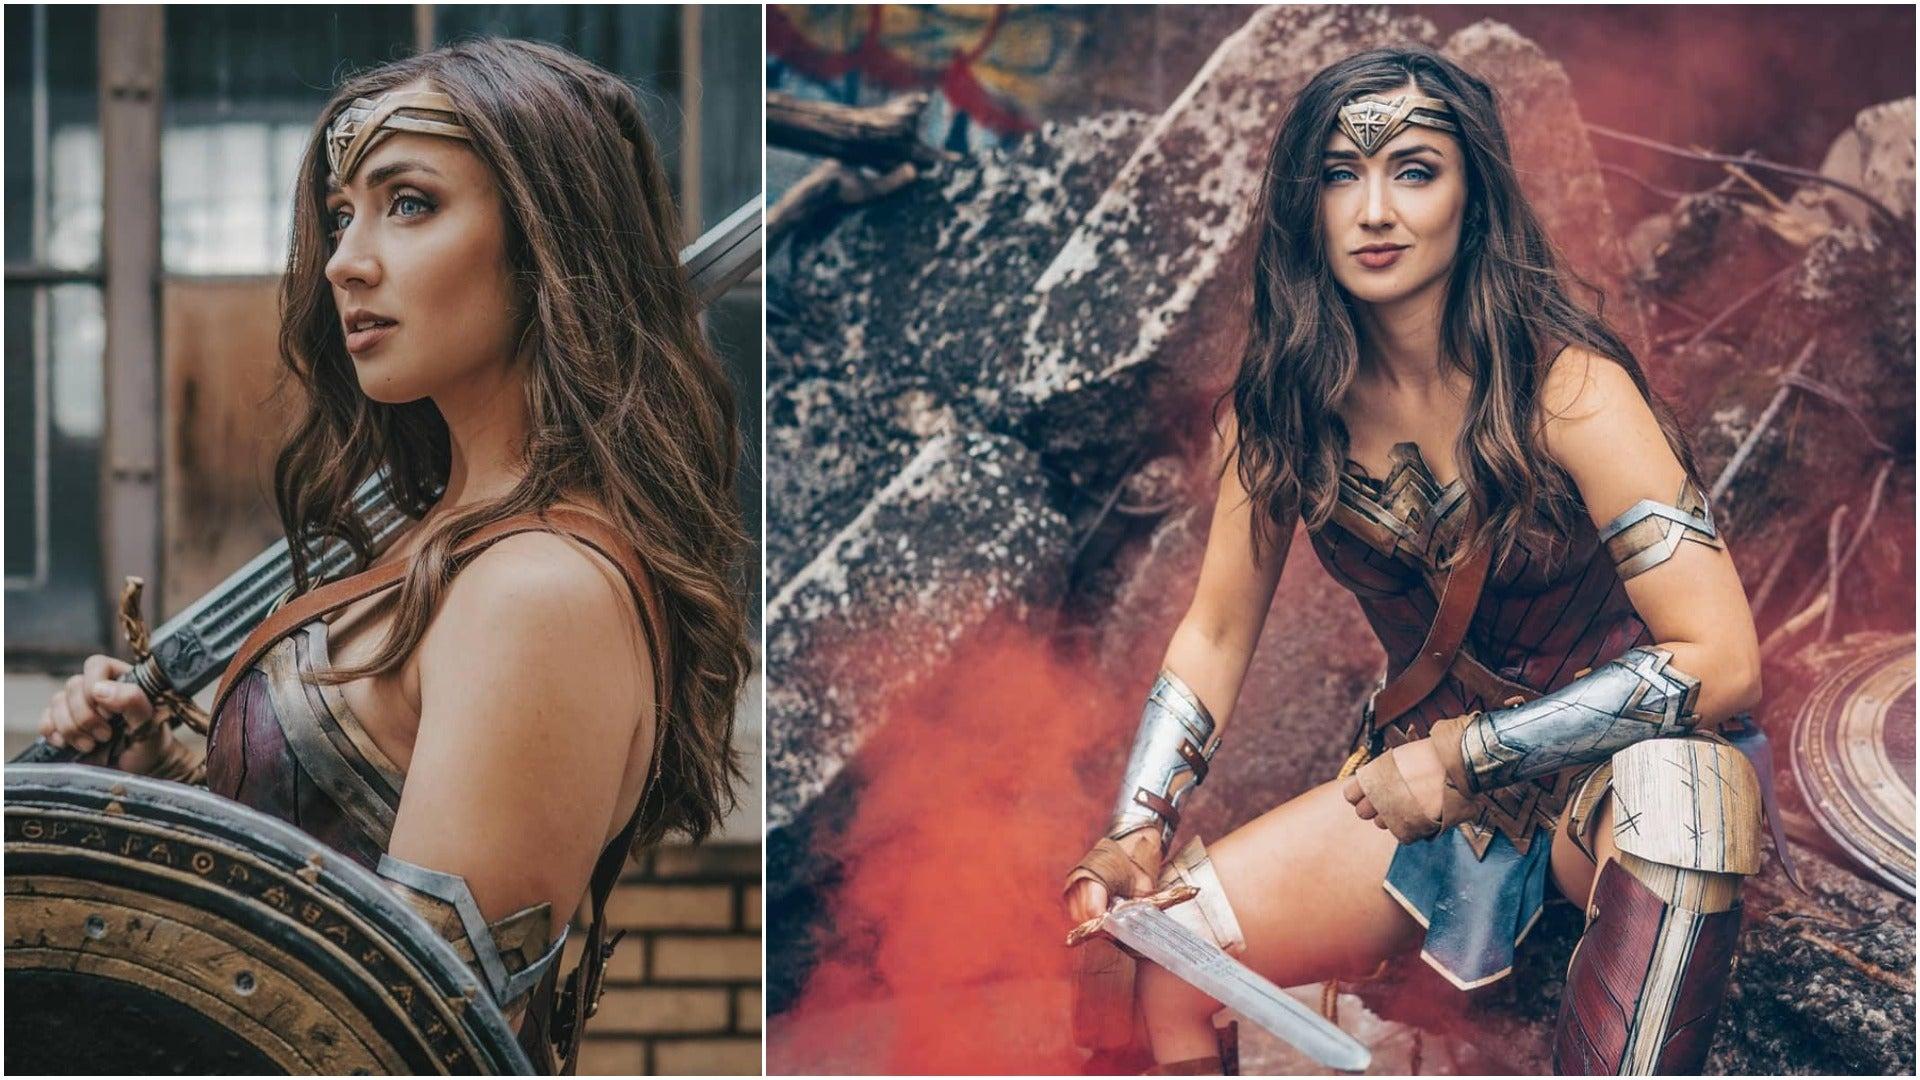 Carma Cosplay in Wonder Woman Cosplay